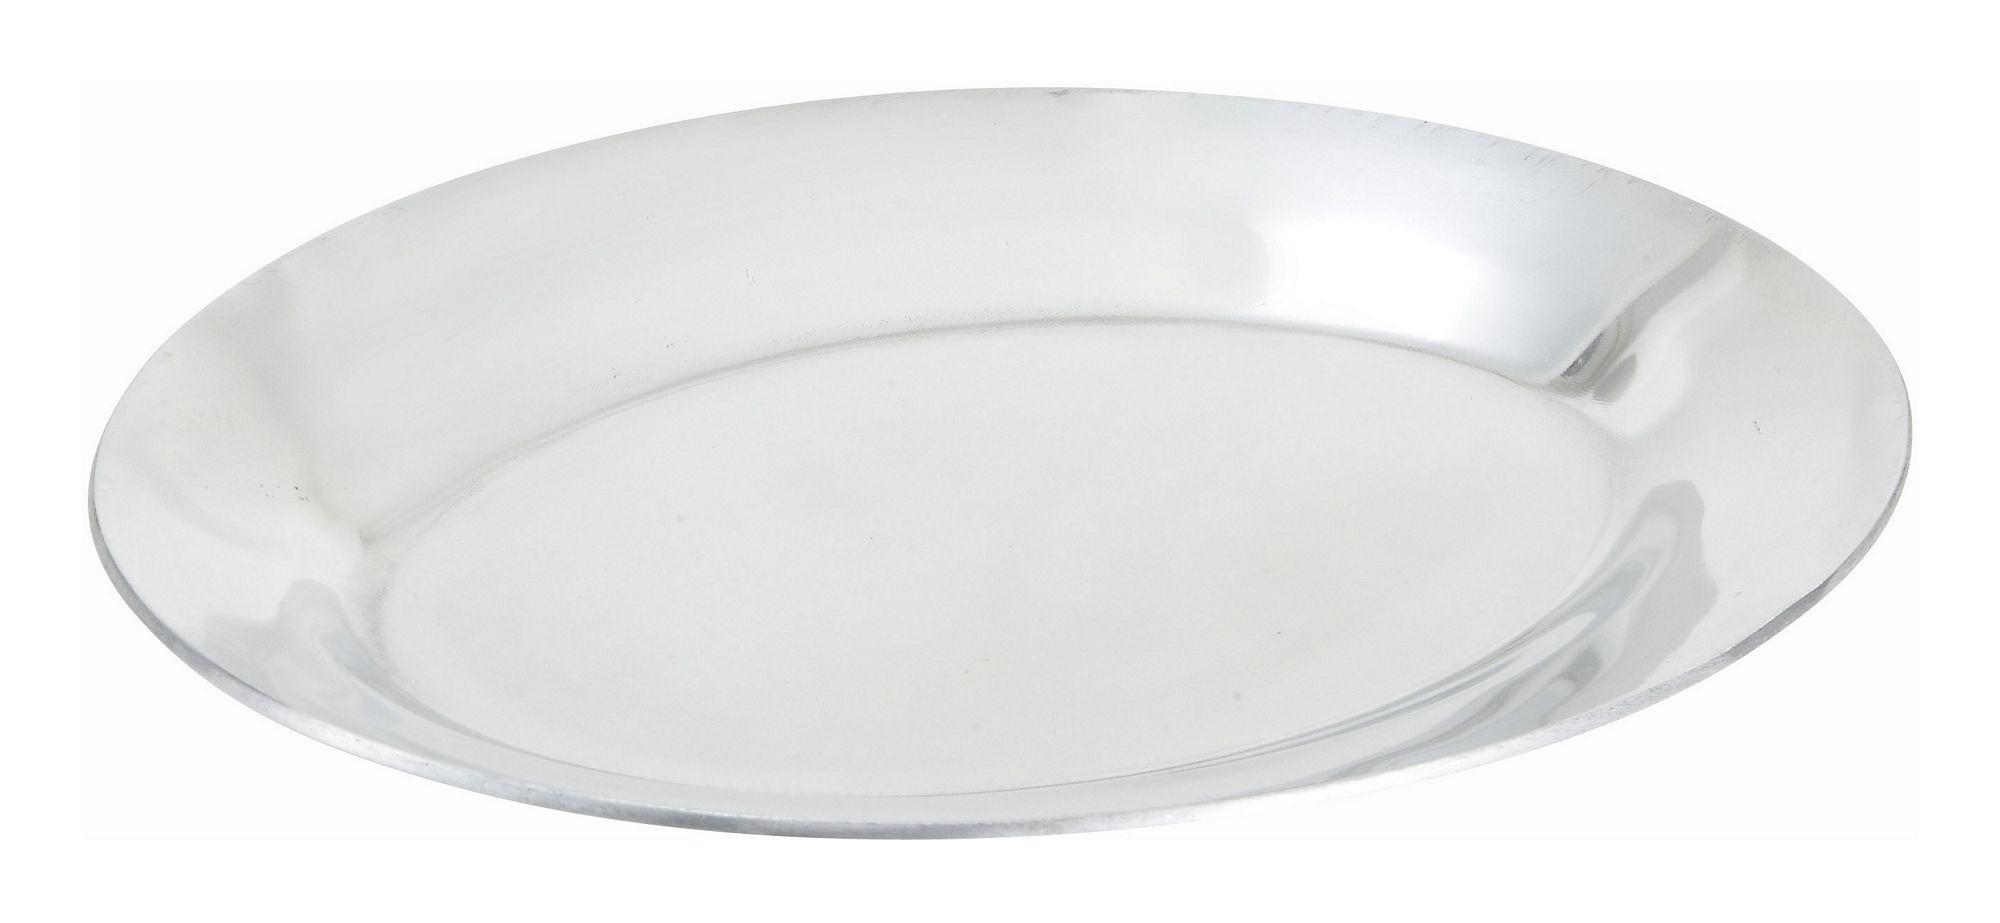 Aluminum Oval Sizzling Platter - 12